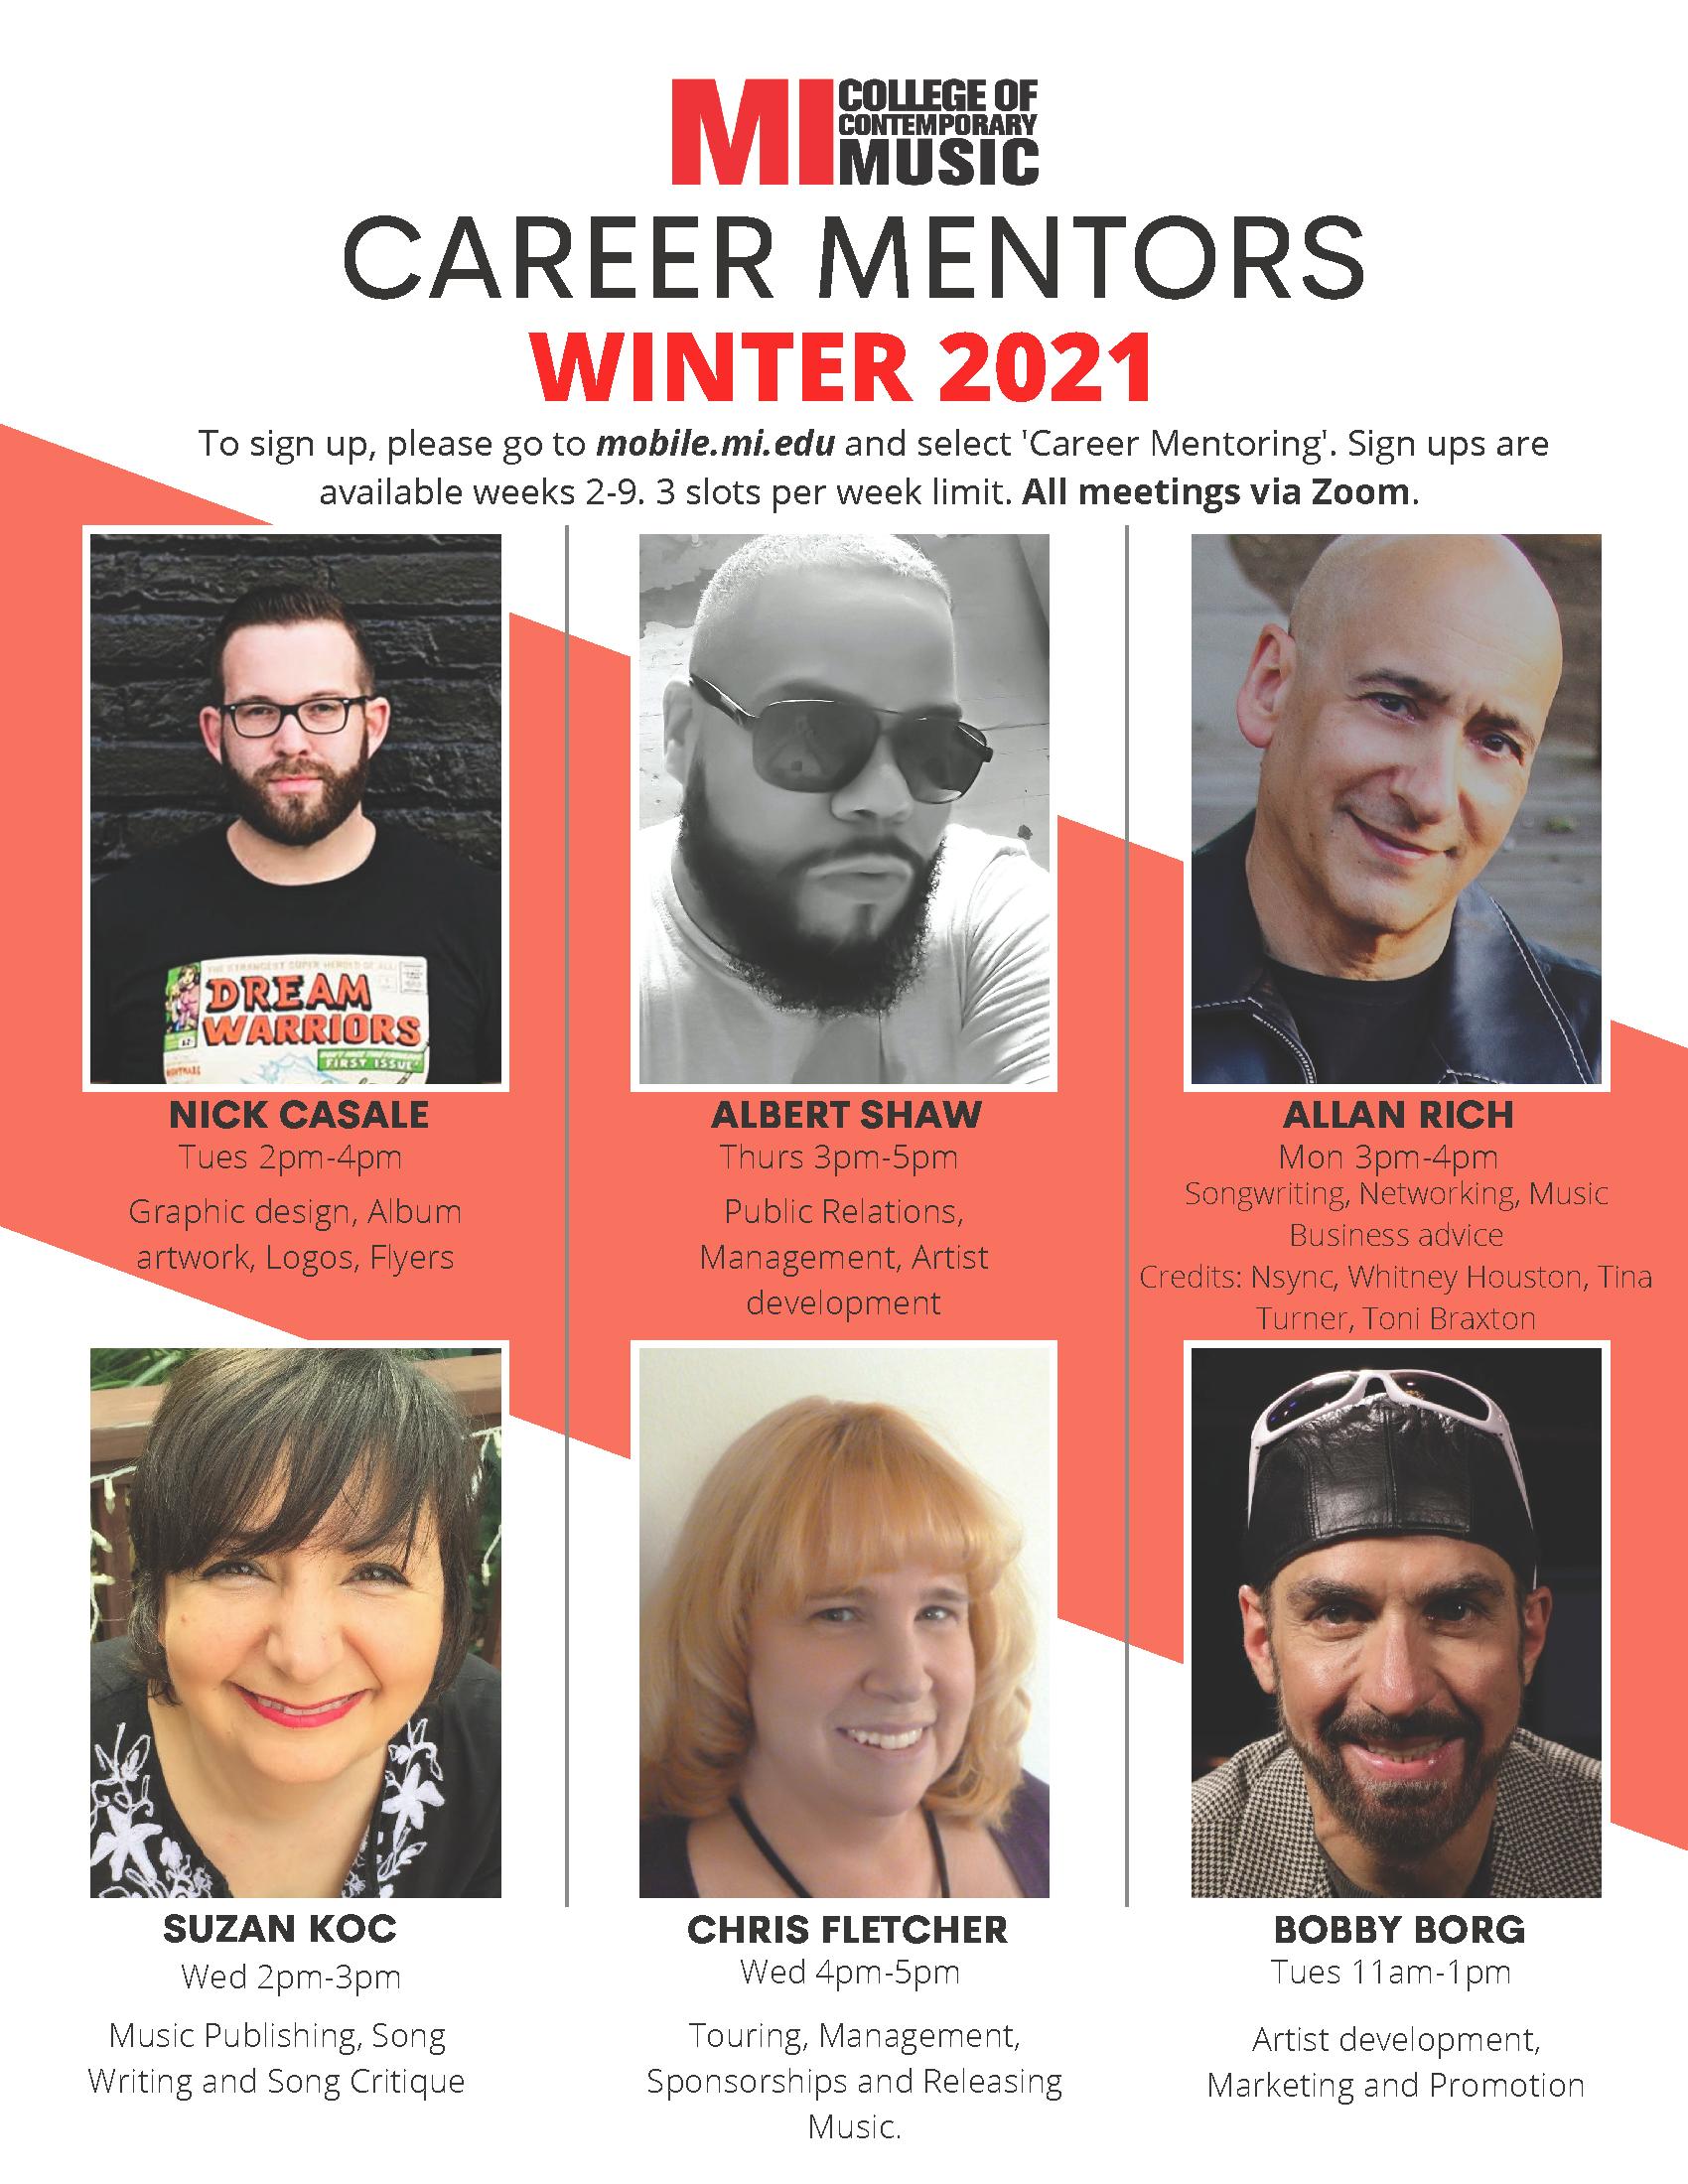 CAREER MENTORS Winter 2021